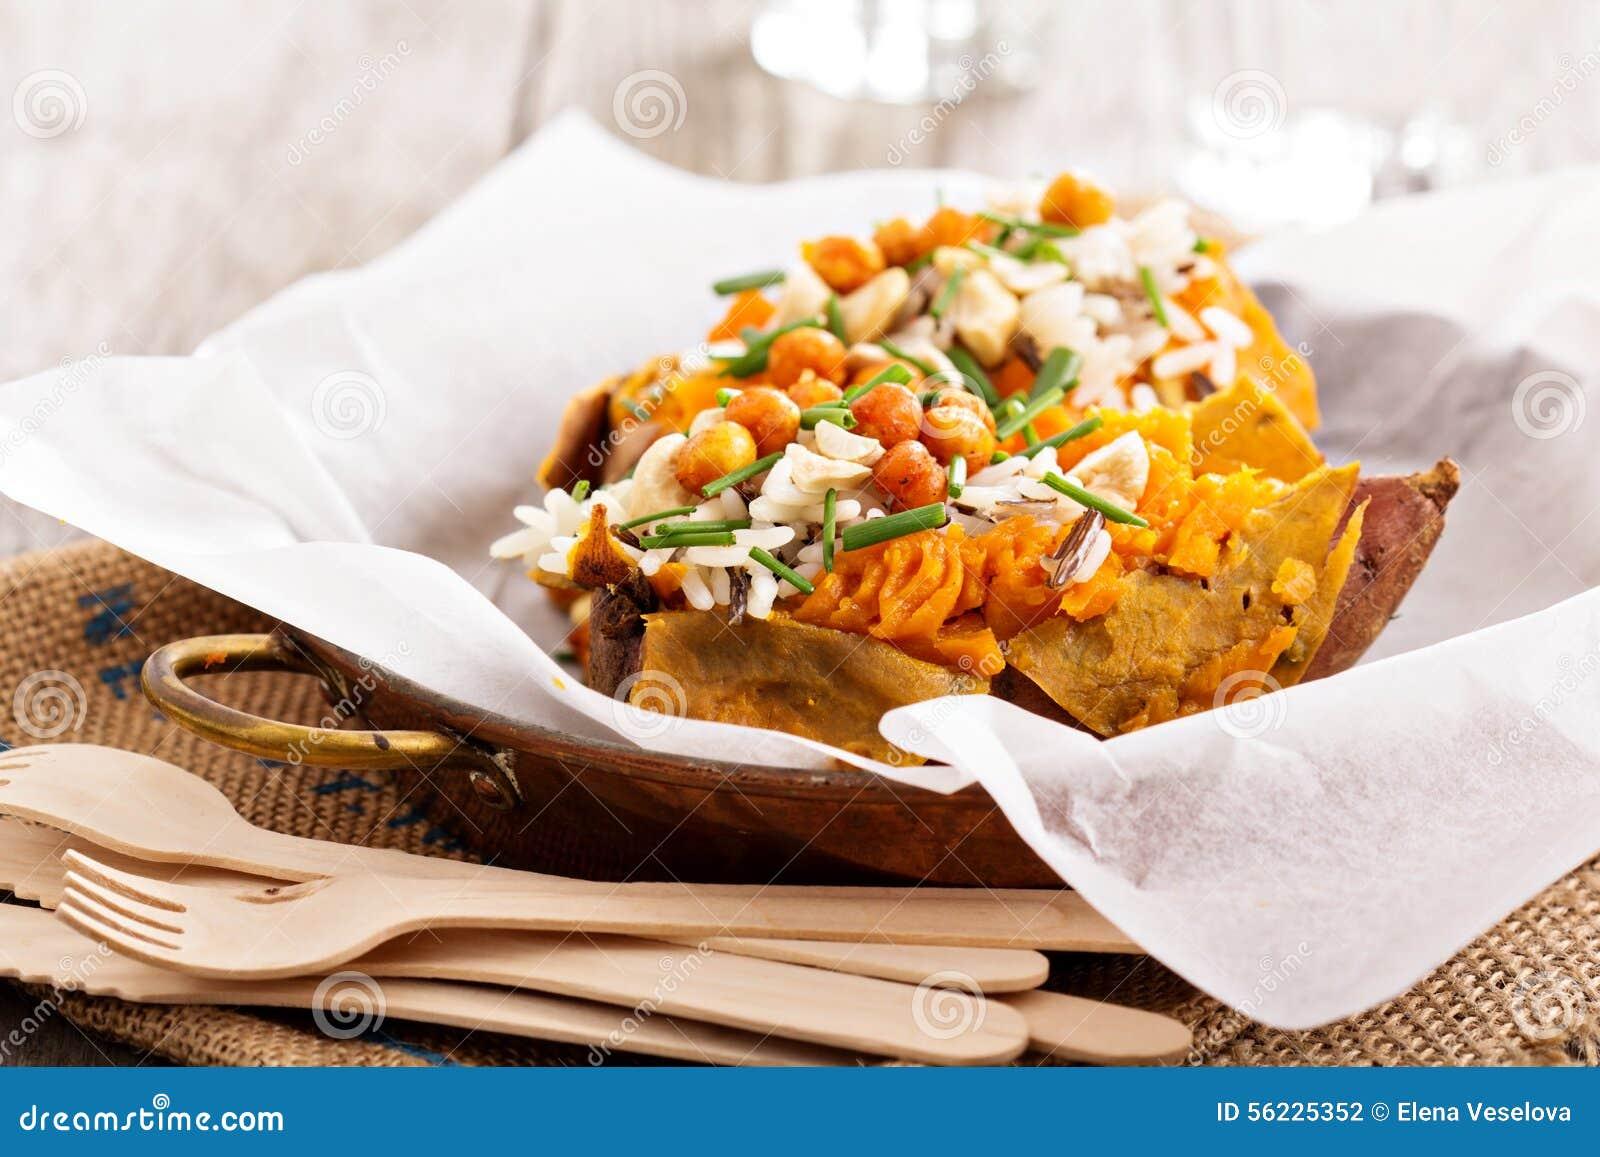 Baked stuffed sweet potato with rice